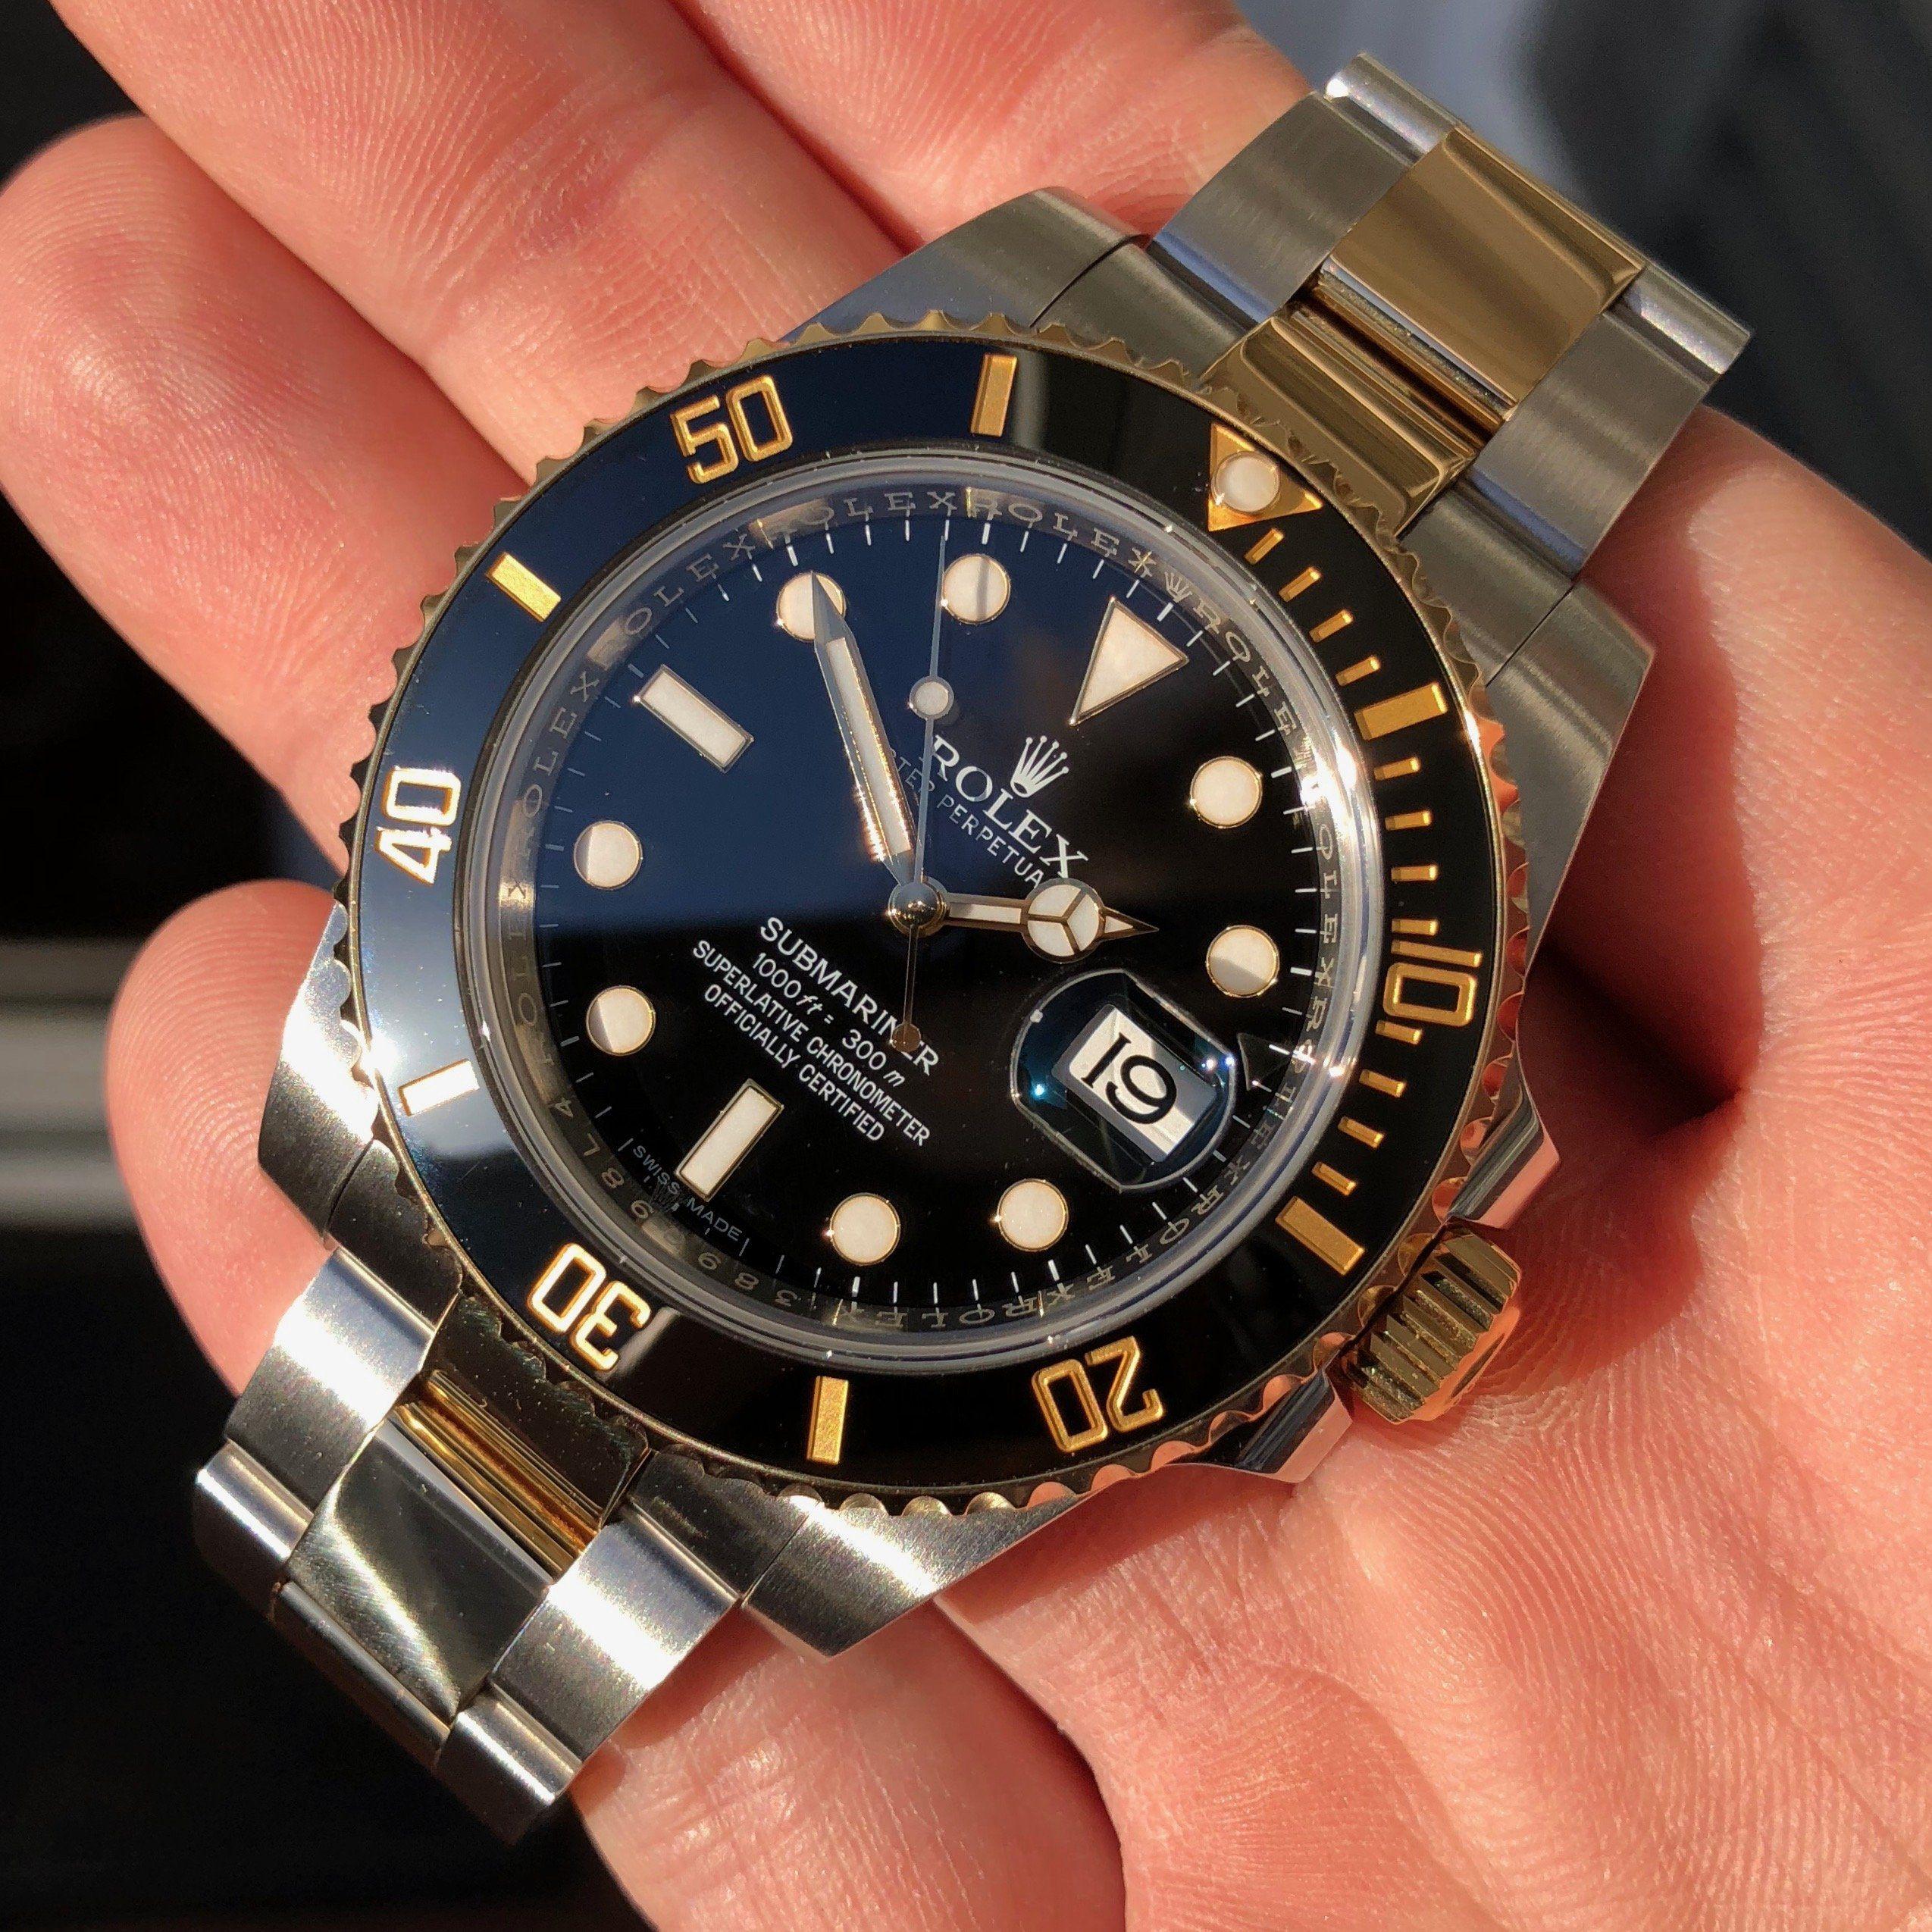 116613ln Rolex Submariner Black Dial With Black Ceramic Bezel Mens Automatic Watch Rolex Submariner For Sale Rolex Submariner Black Rolex Submariner